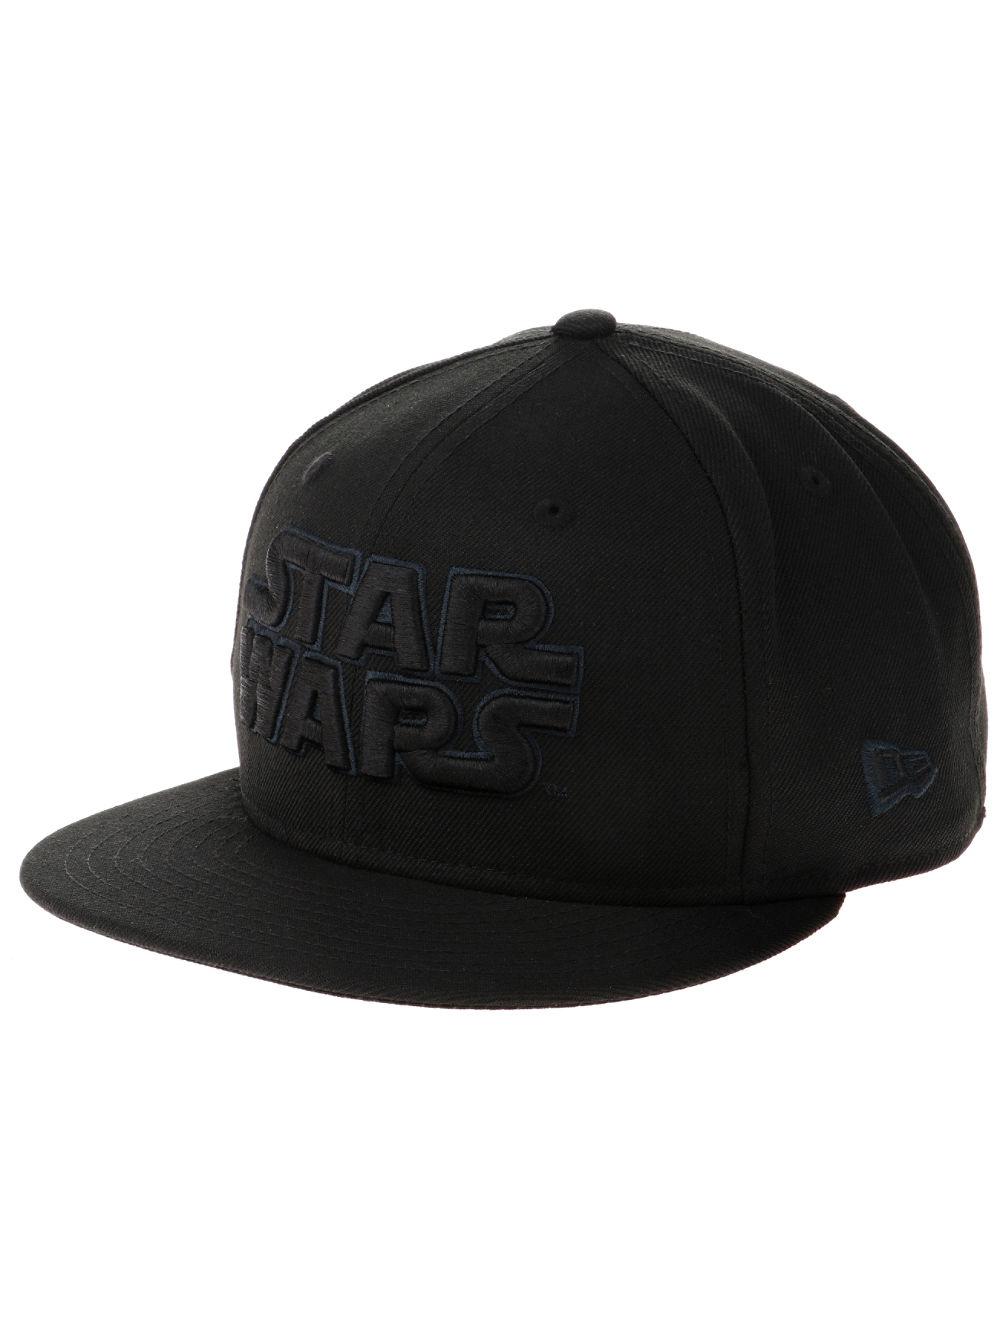 674538e4023a5 Buy New Era Star Wars Black Black Cap online at Blue Tomato